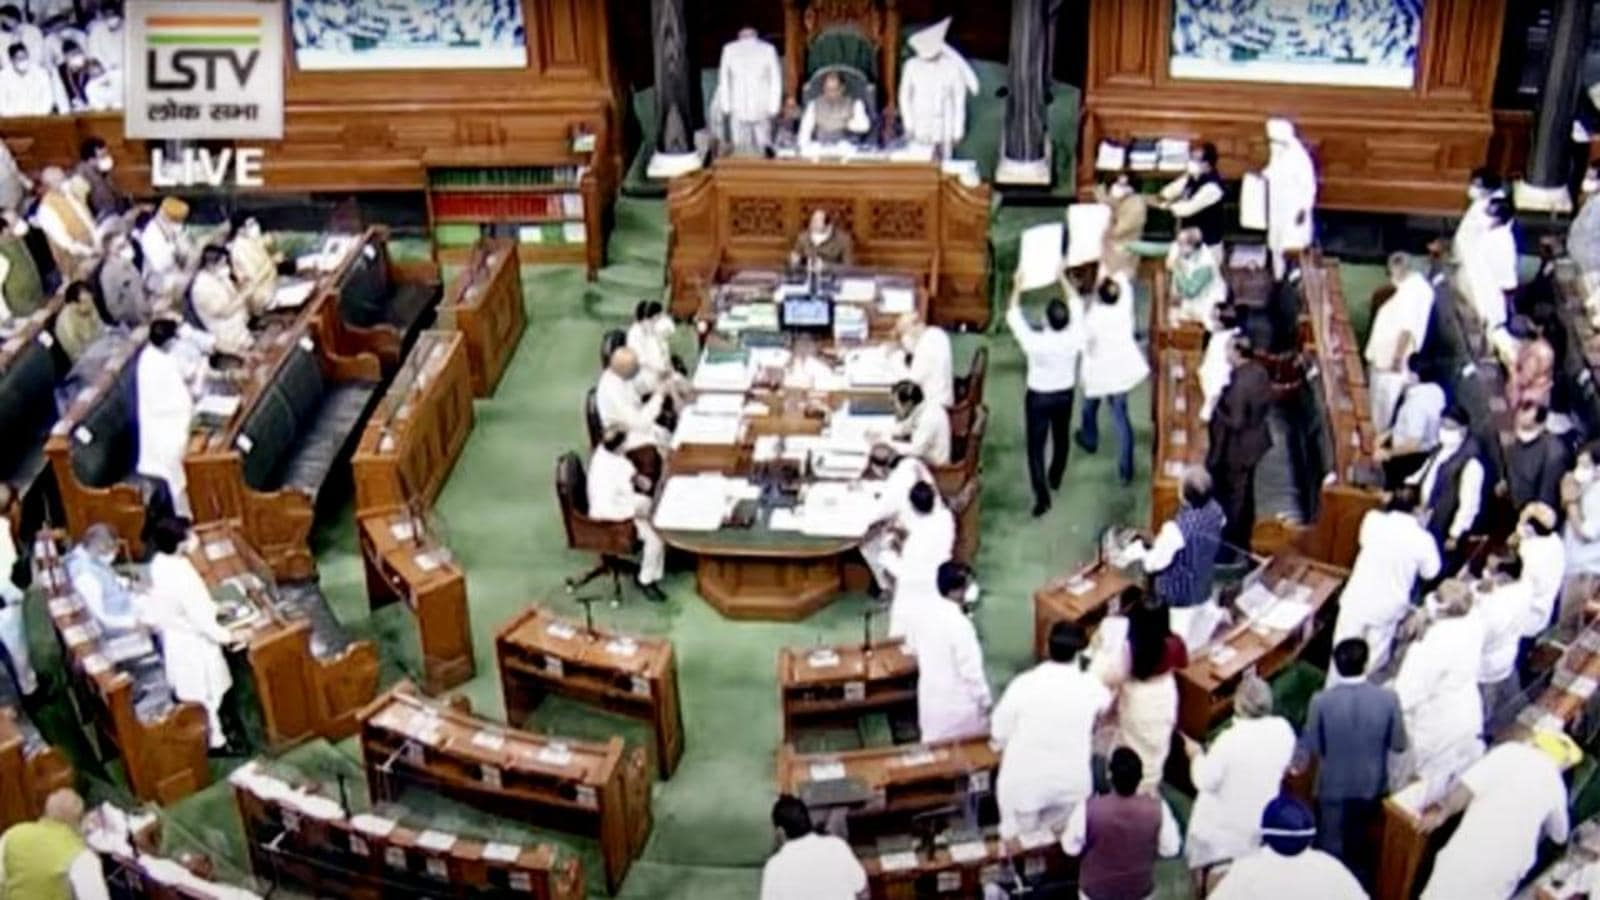 Saddened' over ruckus in House, Lok Sabha Speaker warns of strict action    Latest News India - Hindustan Times